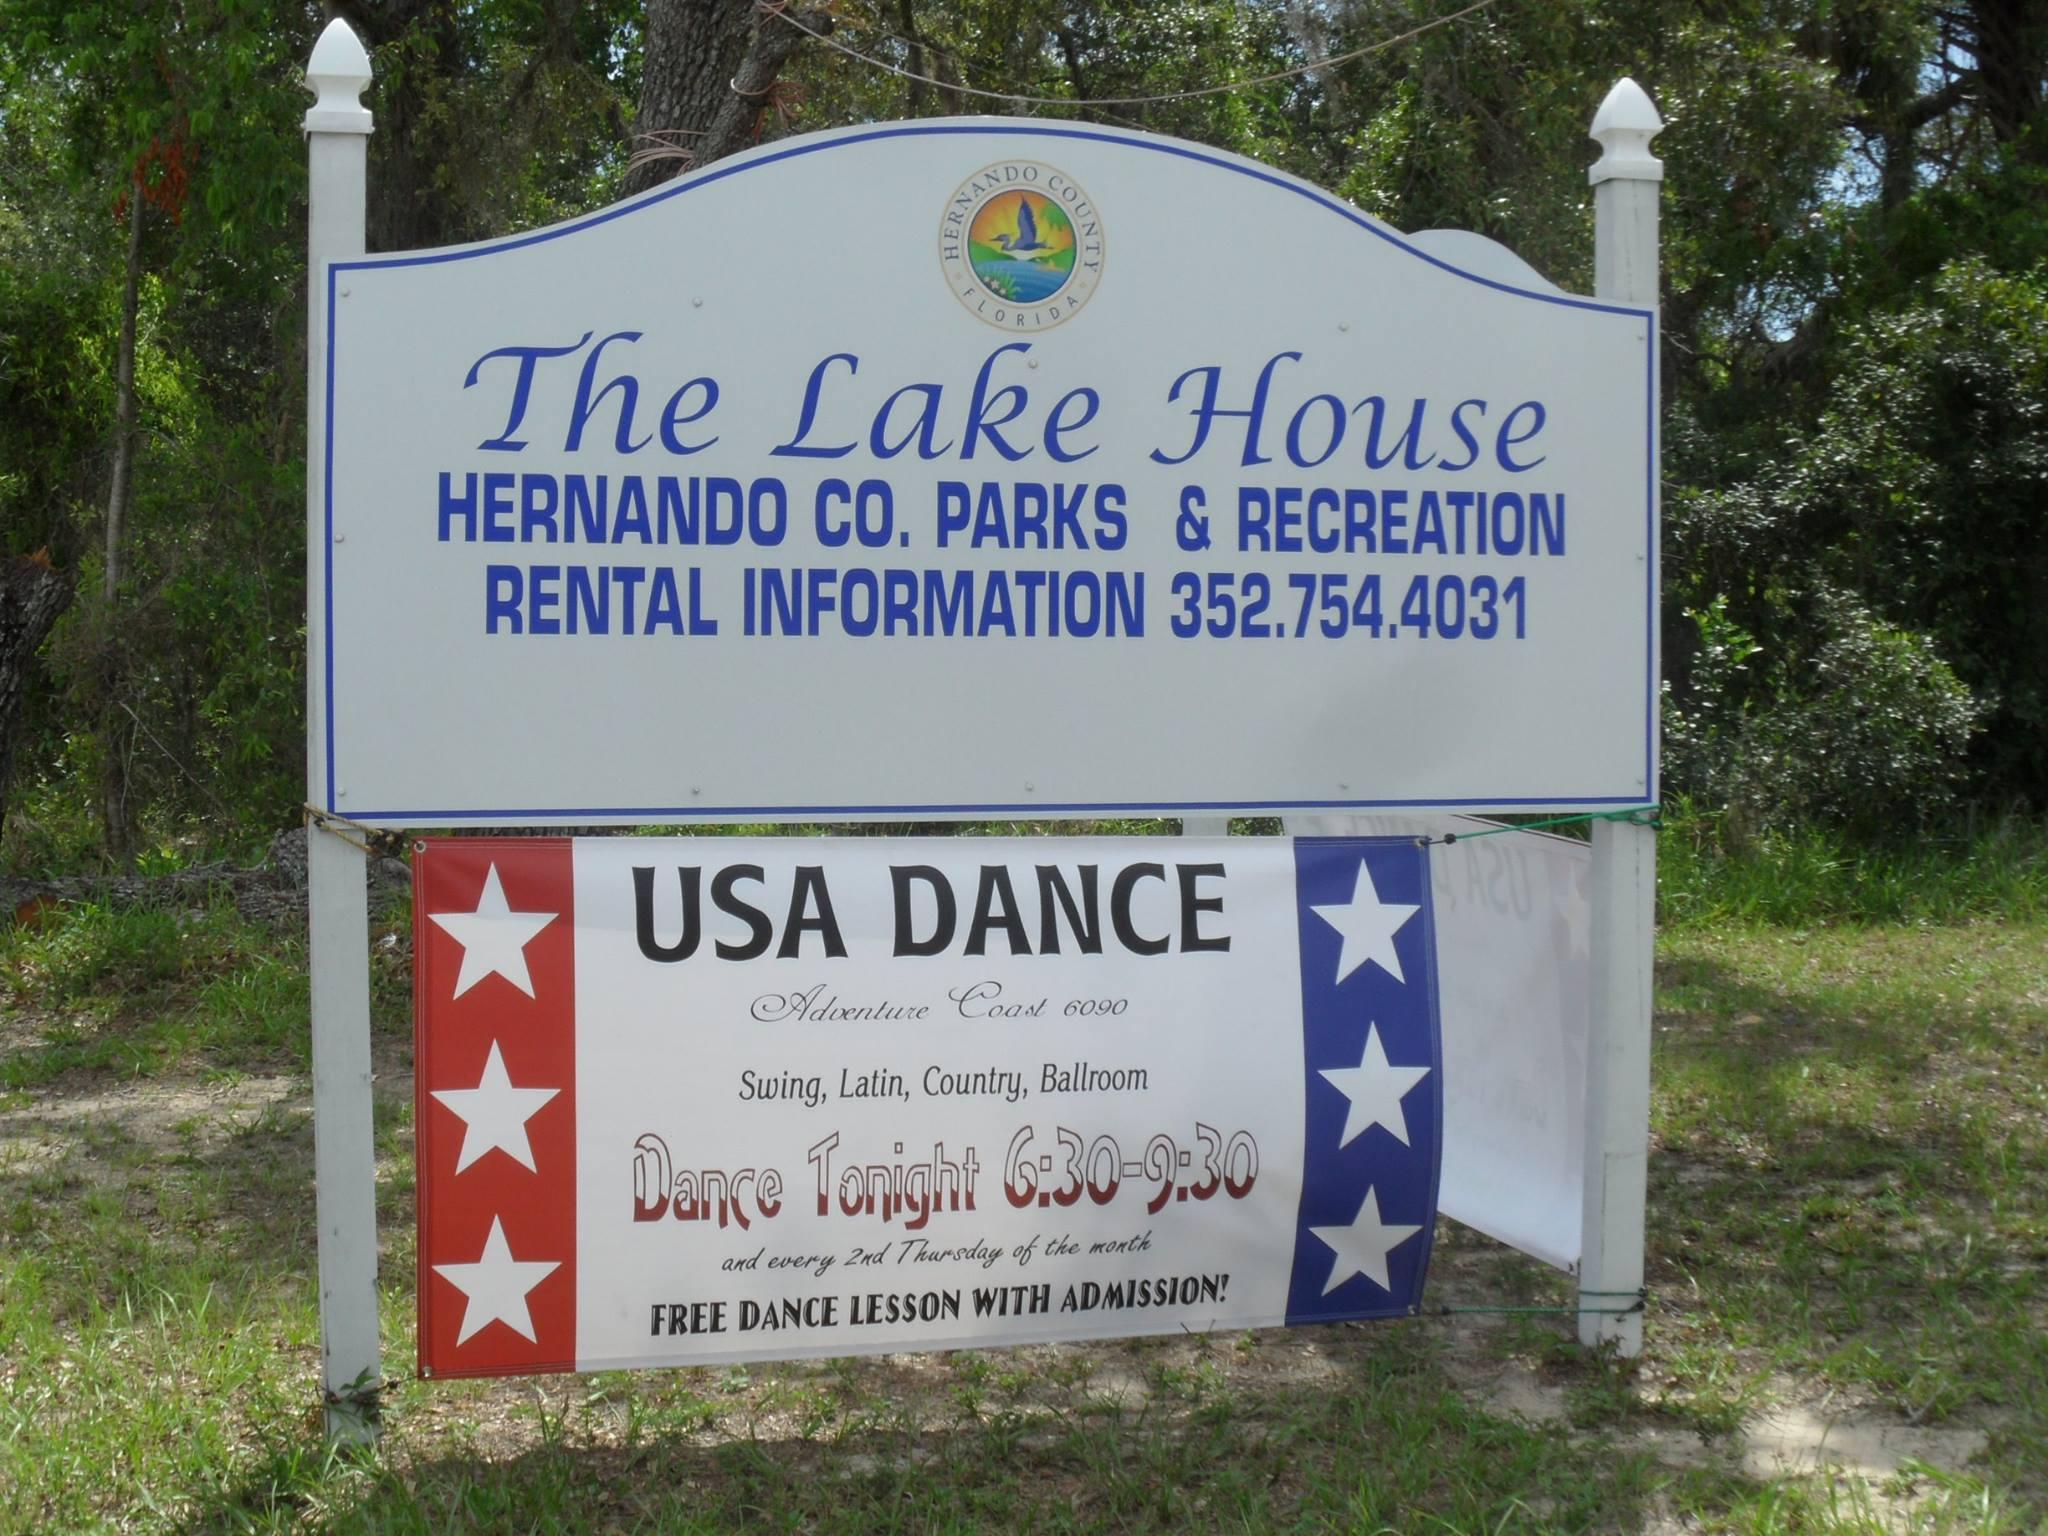 Join USA Dance at The Lake House